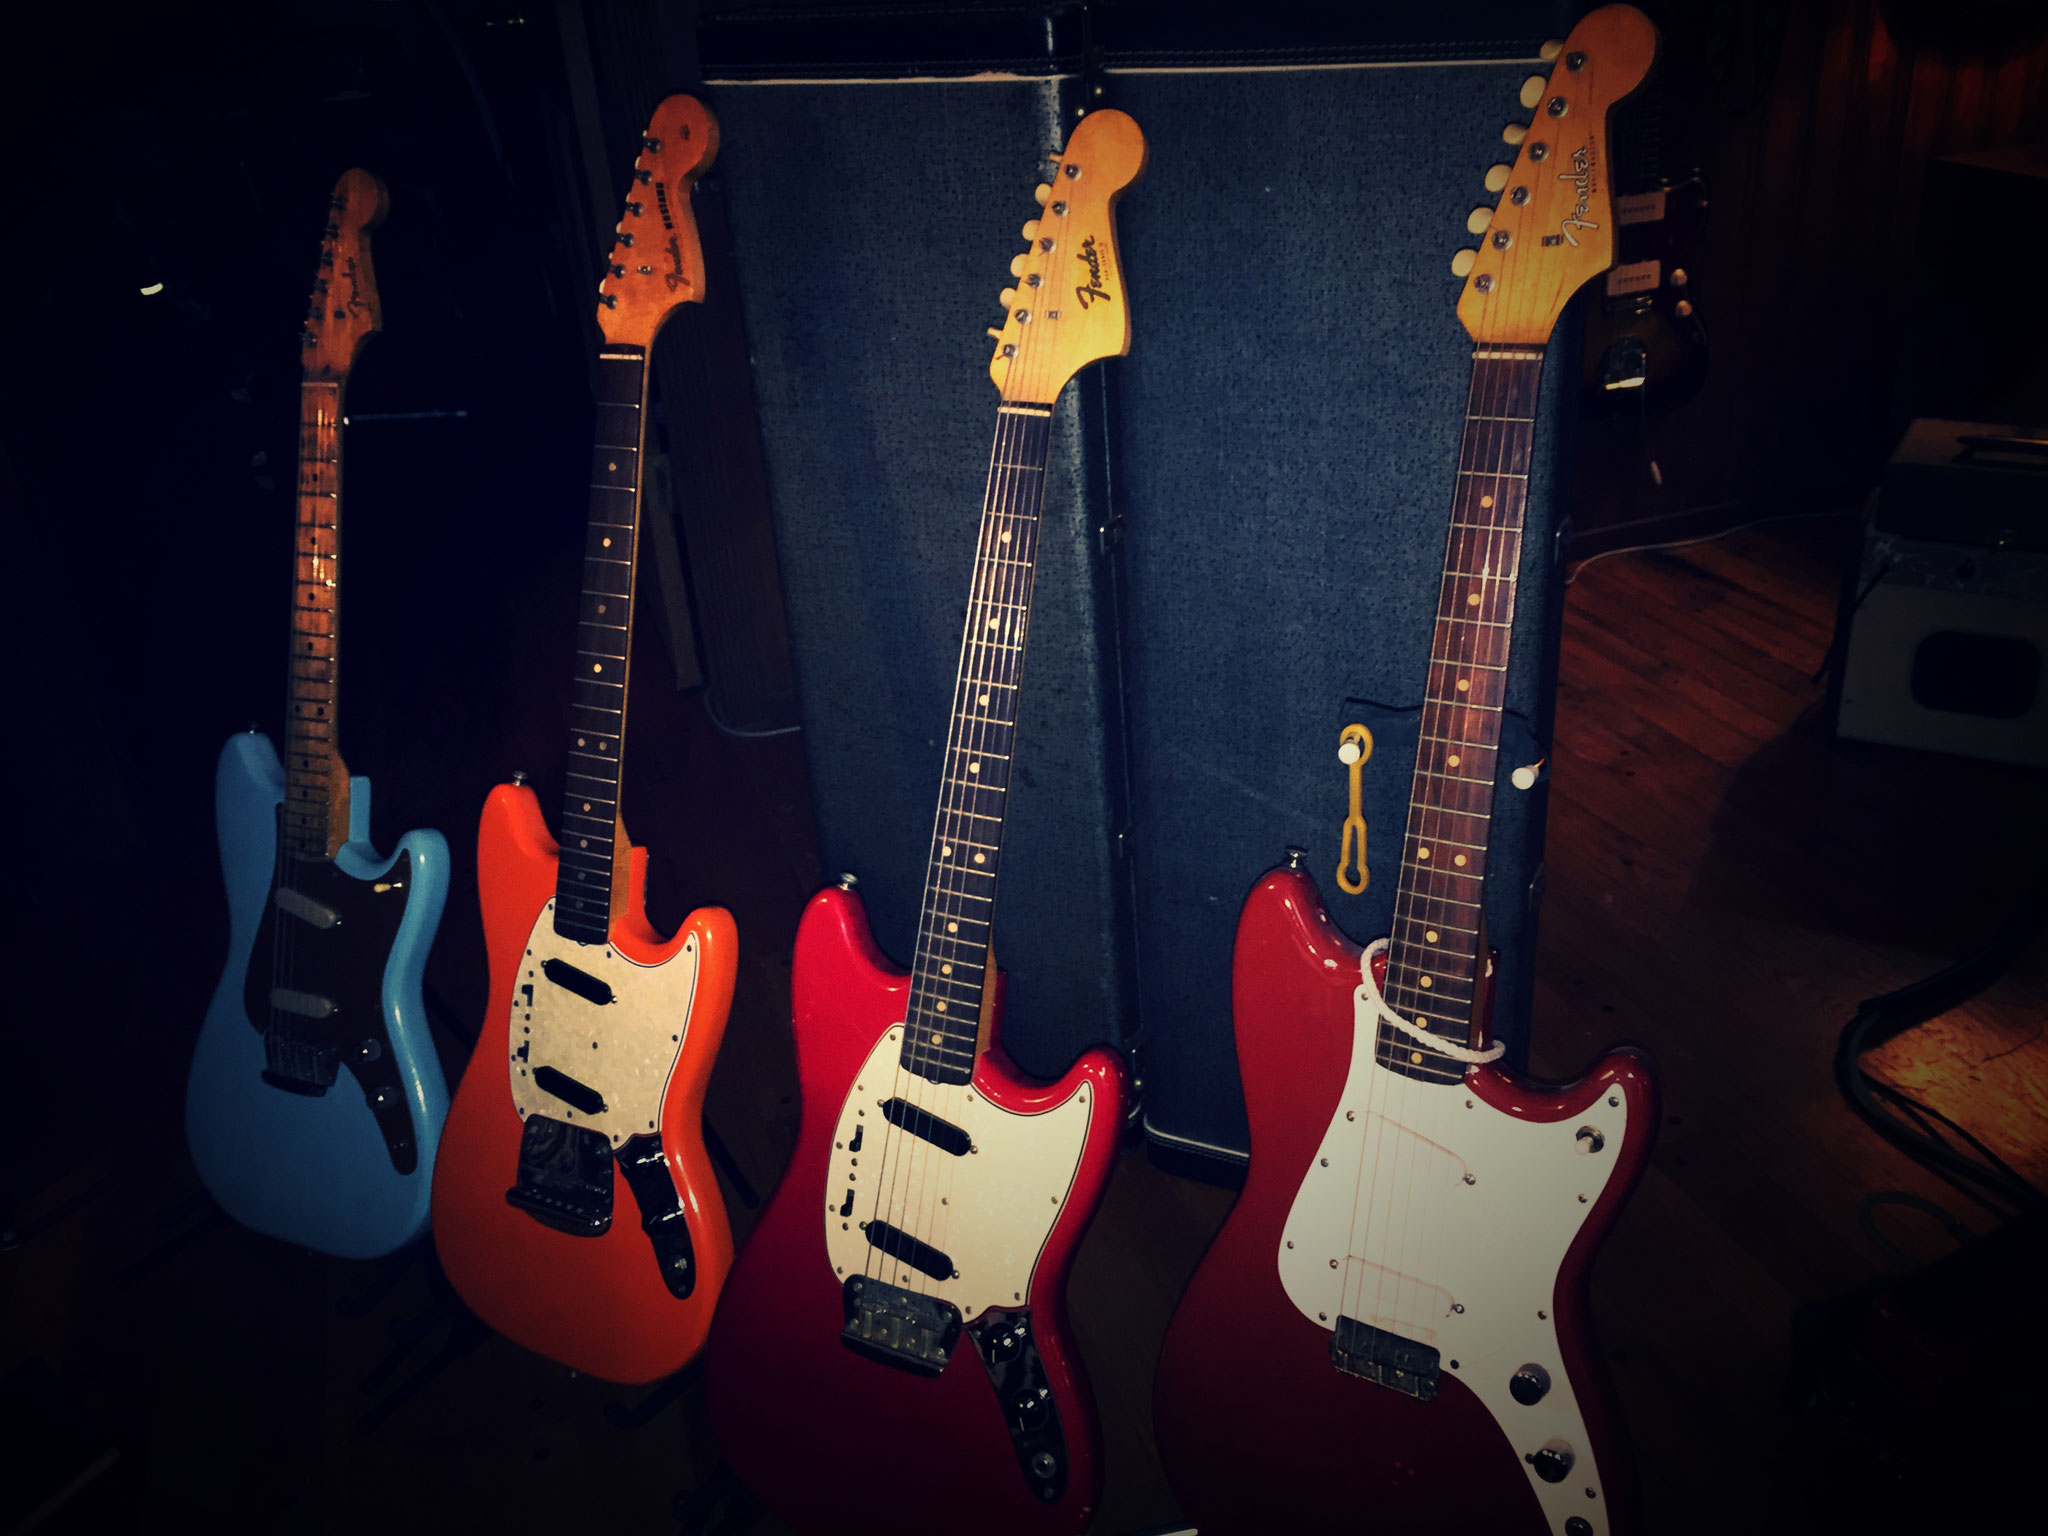 Fender Musicmaster Duo Sonic Mustang